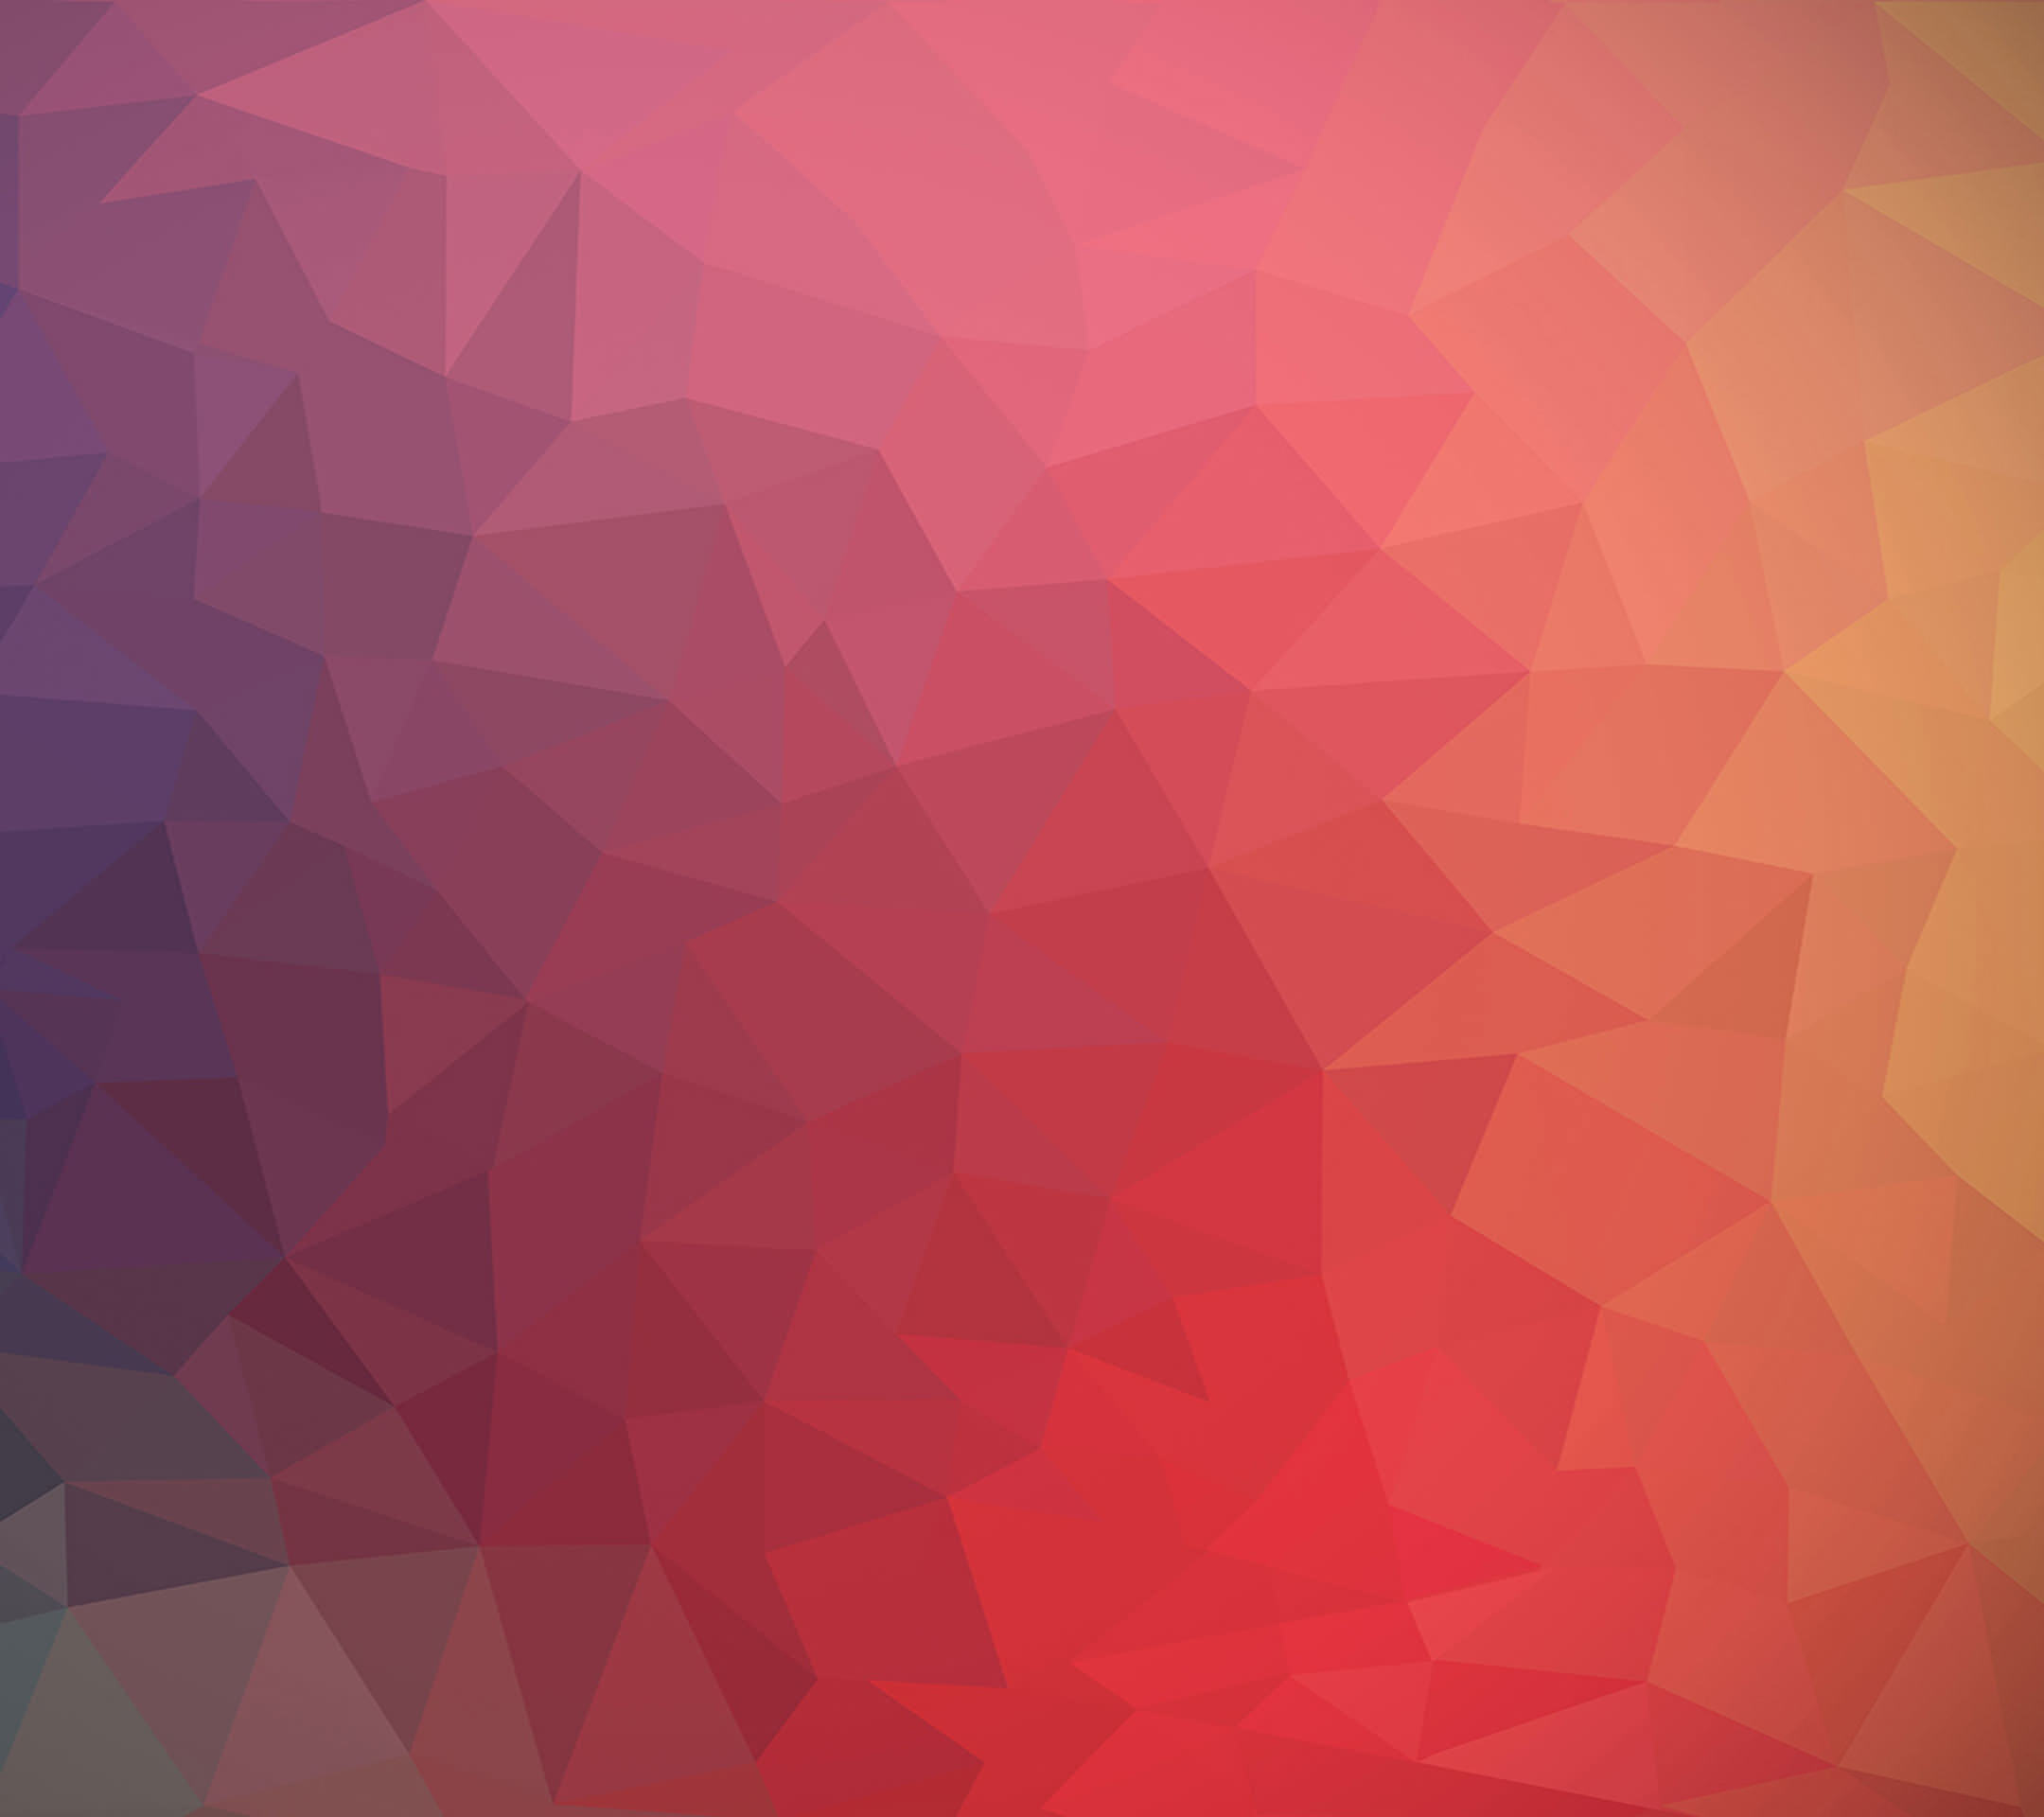 Naranja Patrón De Color Rojo Guay Shito